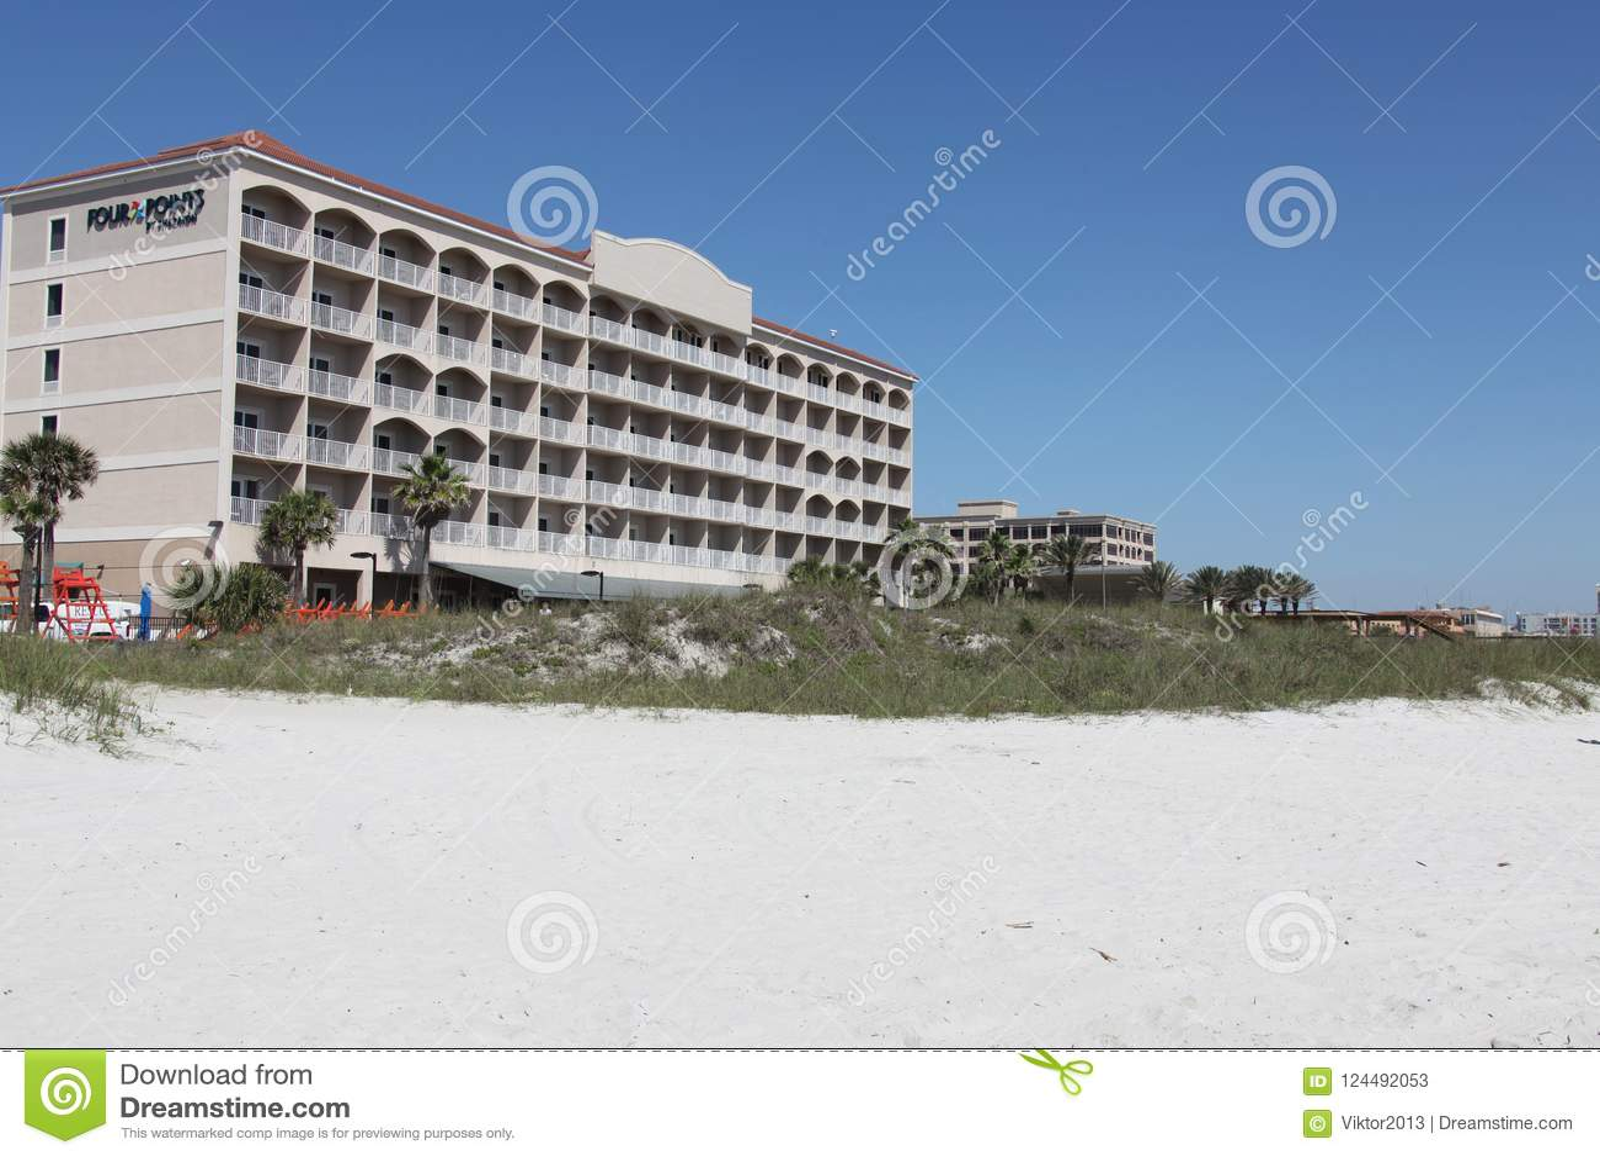 City of jacksonville beach in florida